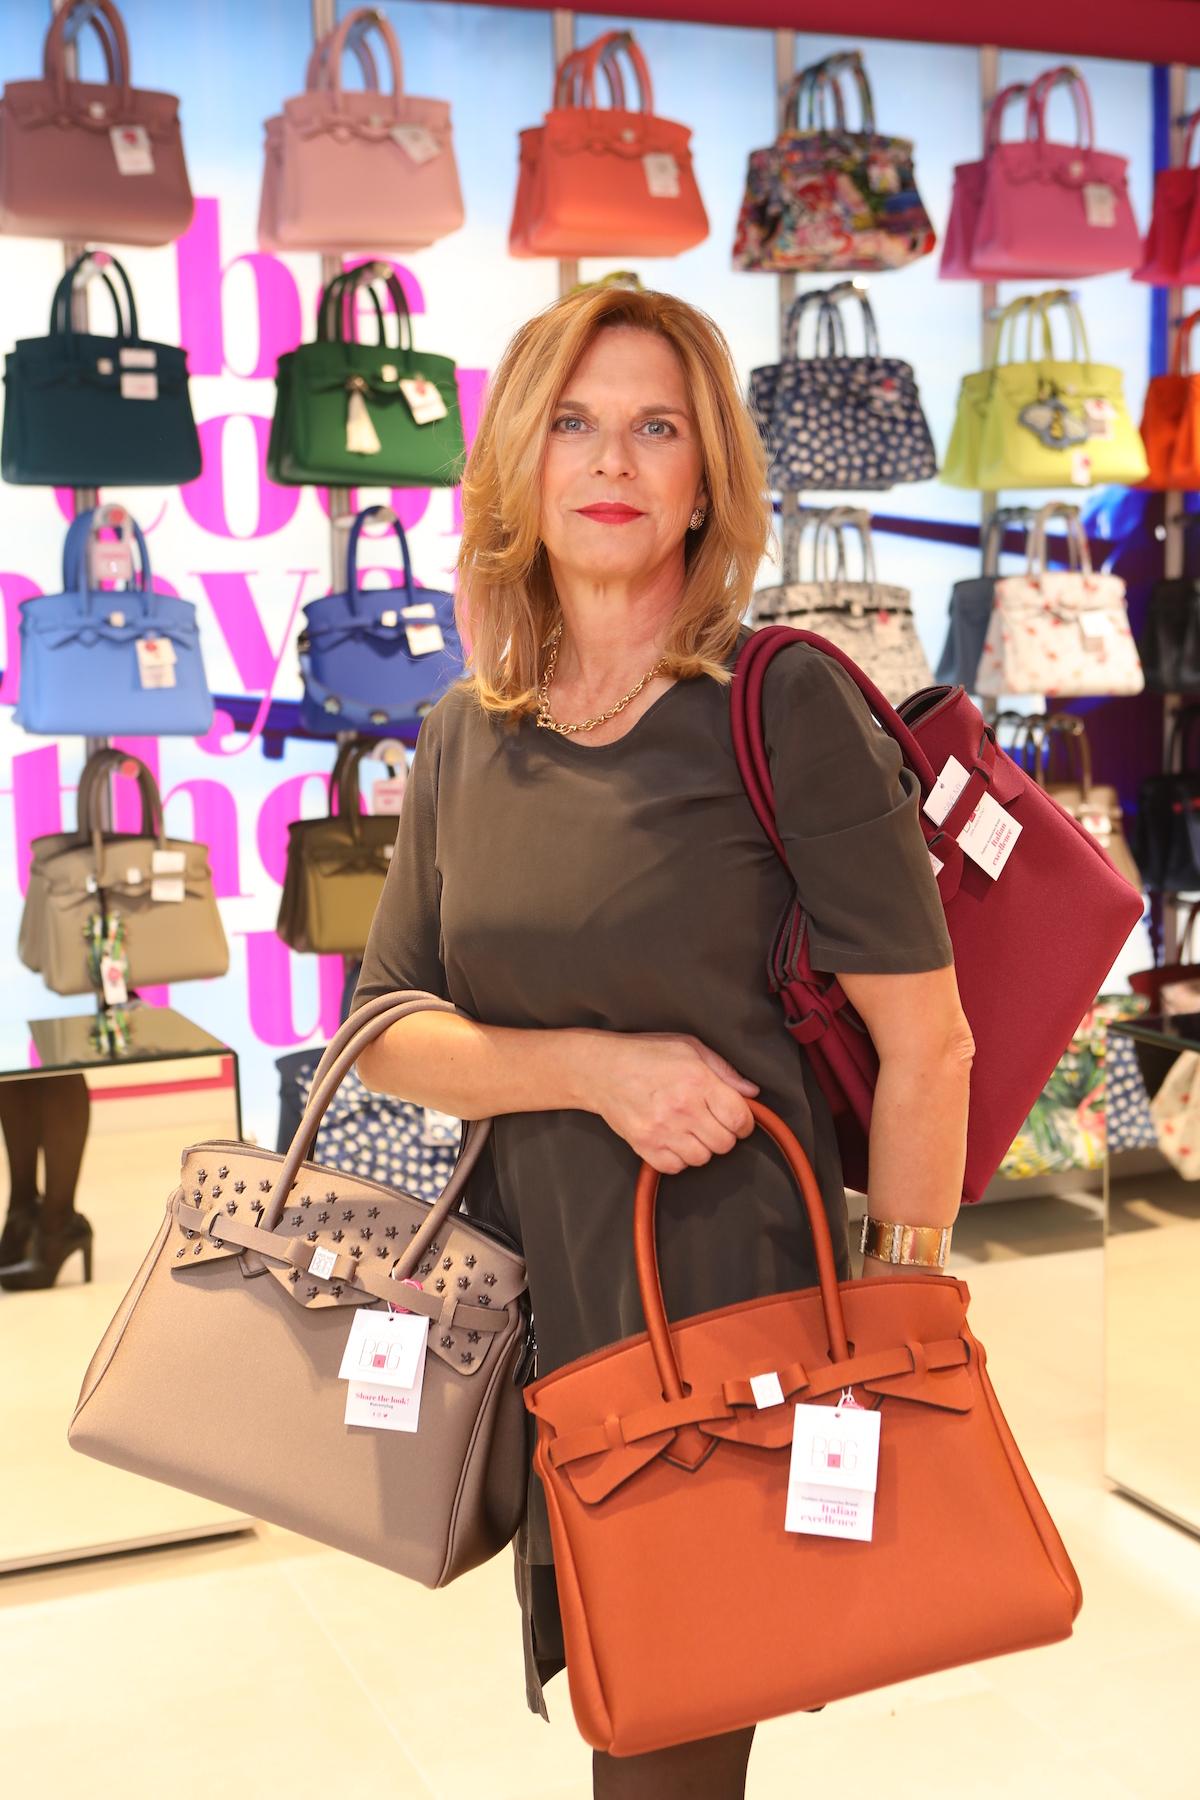 Spolumajitelka butiku Save My Bag Alena Tatarová